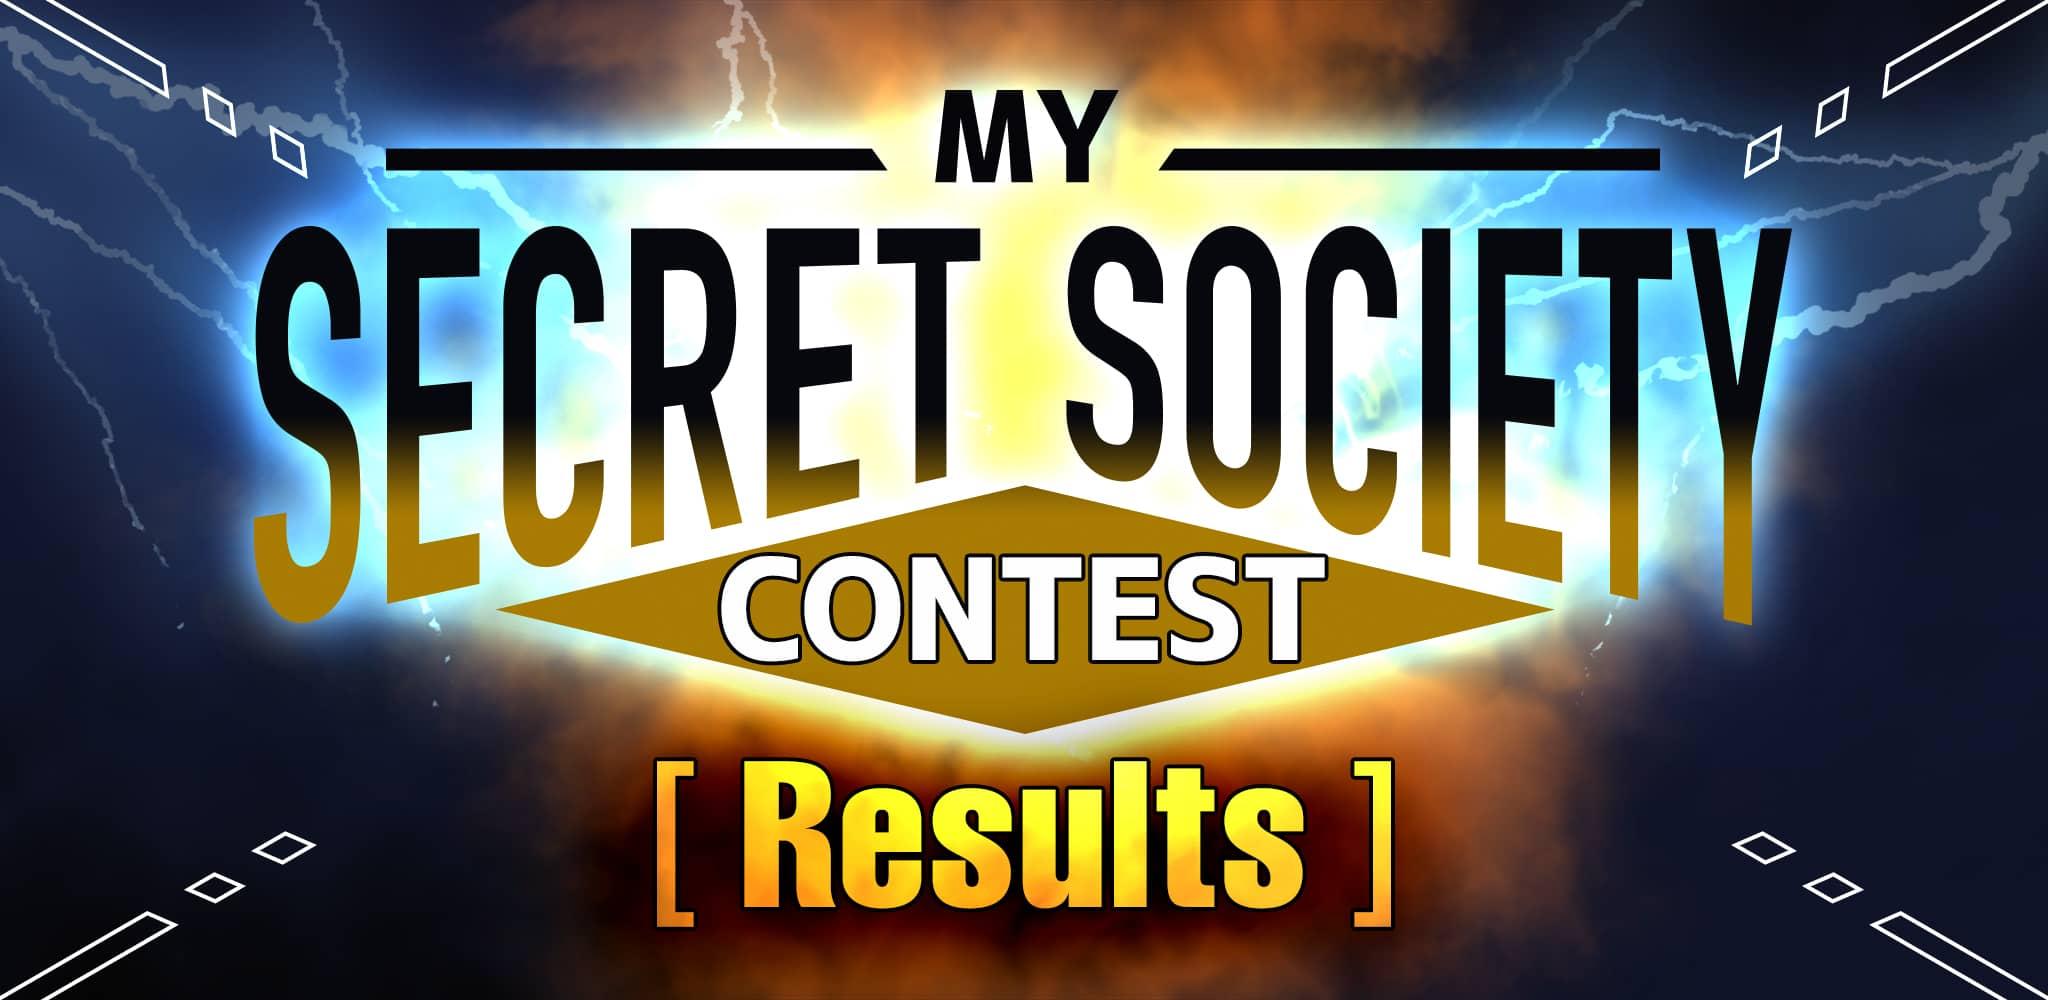 My Secret Society Contest  Contest - ART street by MediBang